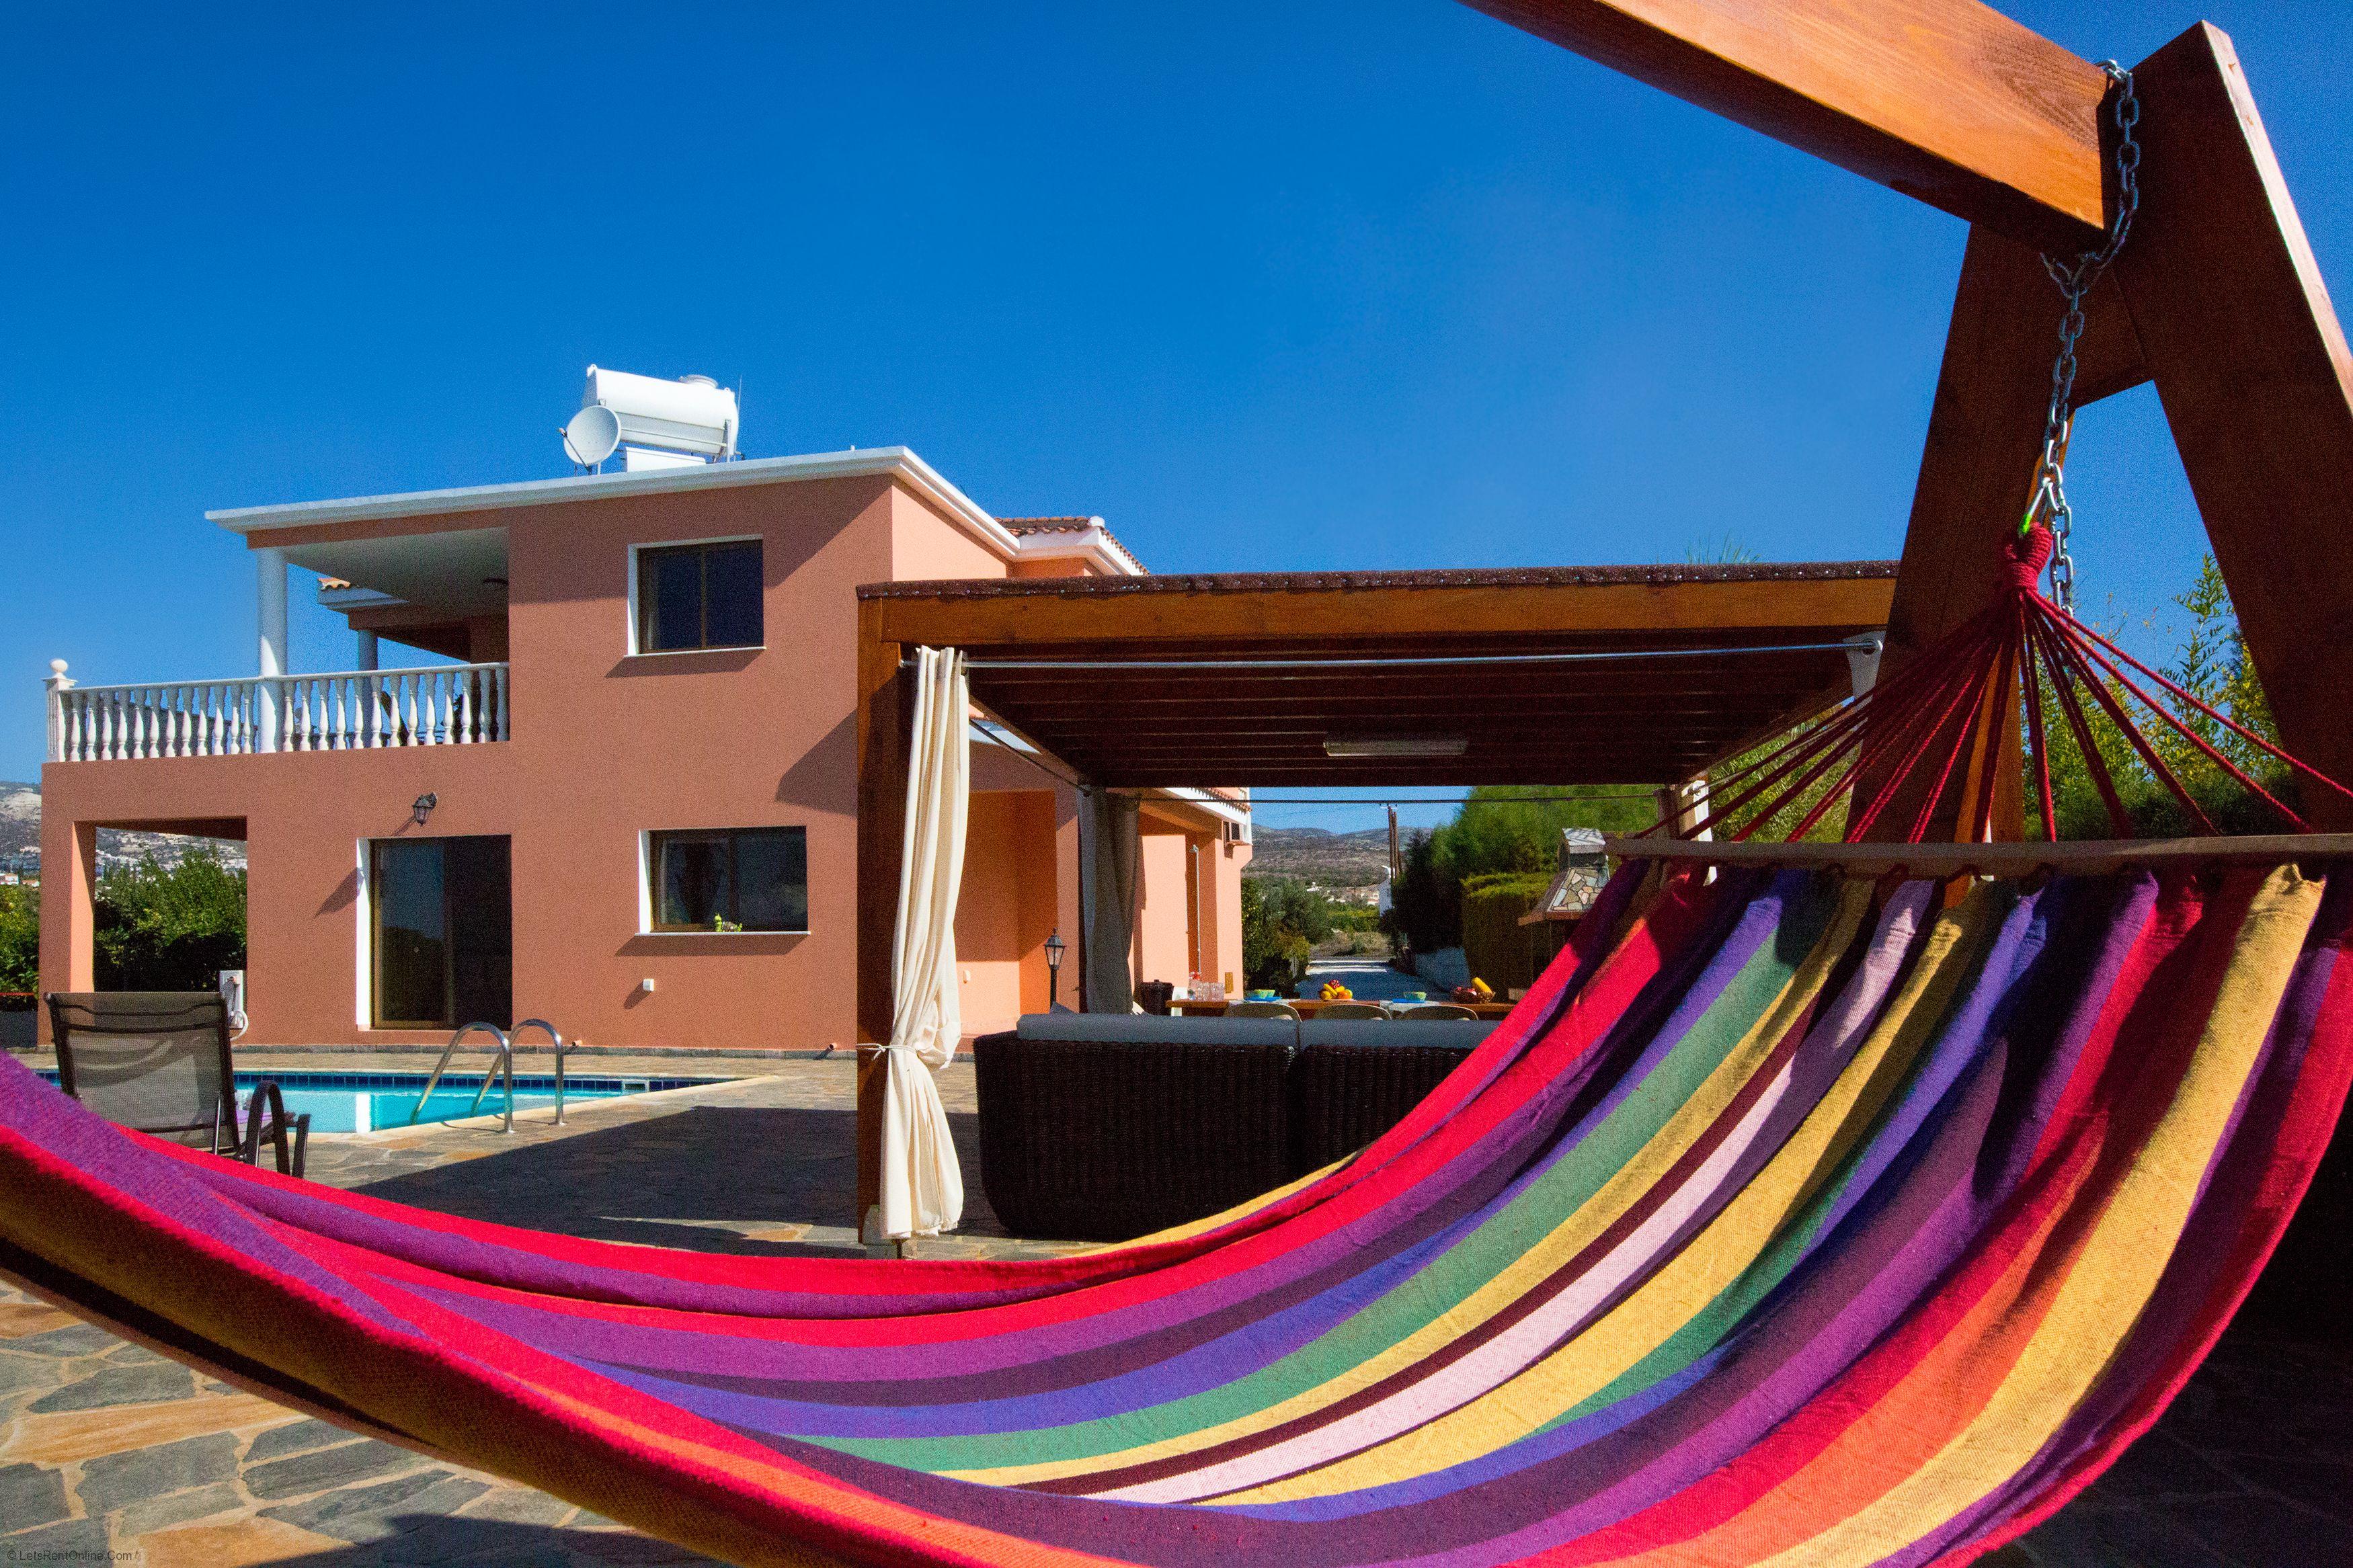 Coral Bay Villa Anna Marina Relax on the Hammock